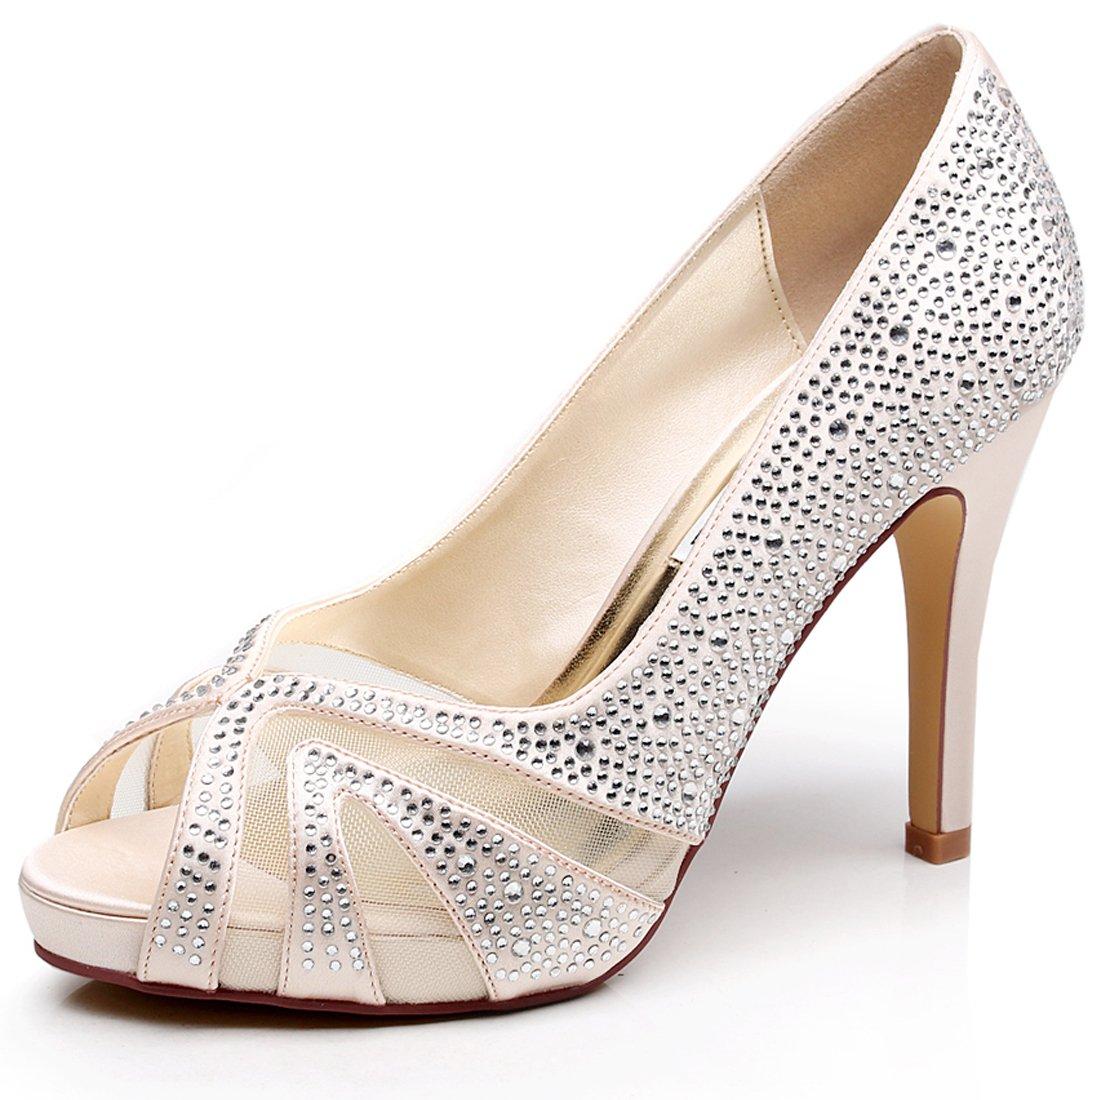 d8064a2816b45 LUXVEER Satin Bridal Shoes with Silver Rhinestone Wedding Shoes Medium Heel  4 inch-Peep Toe